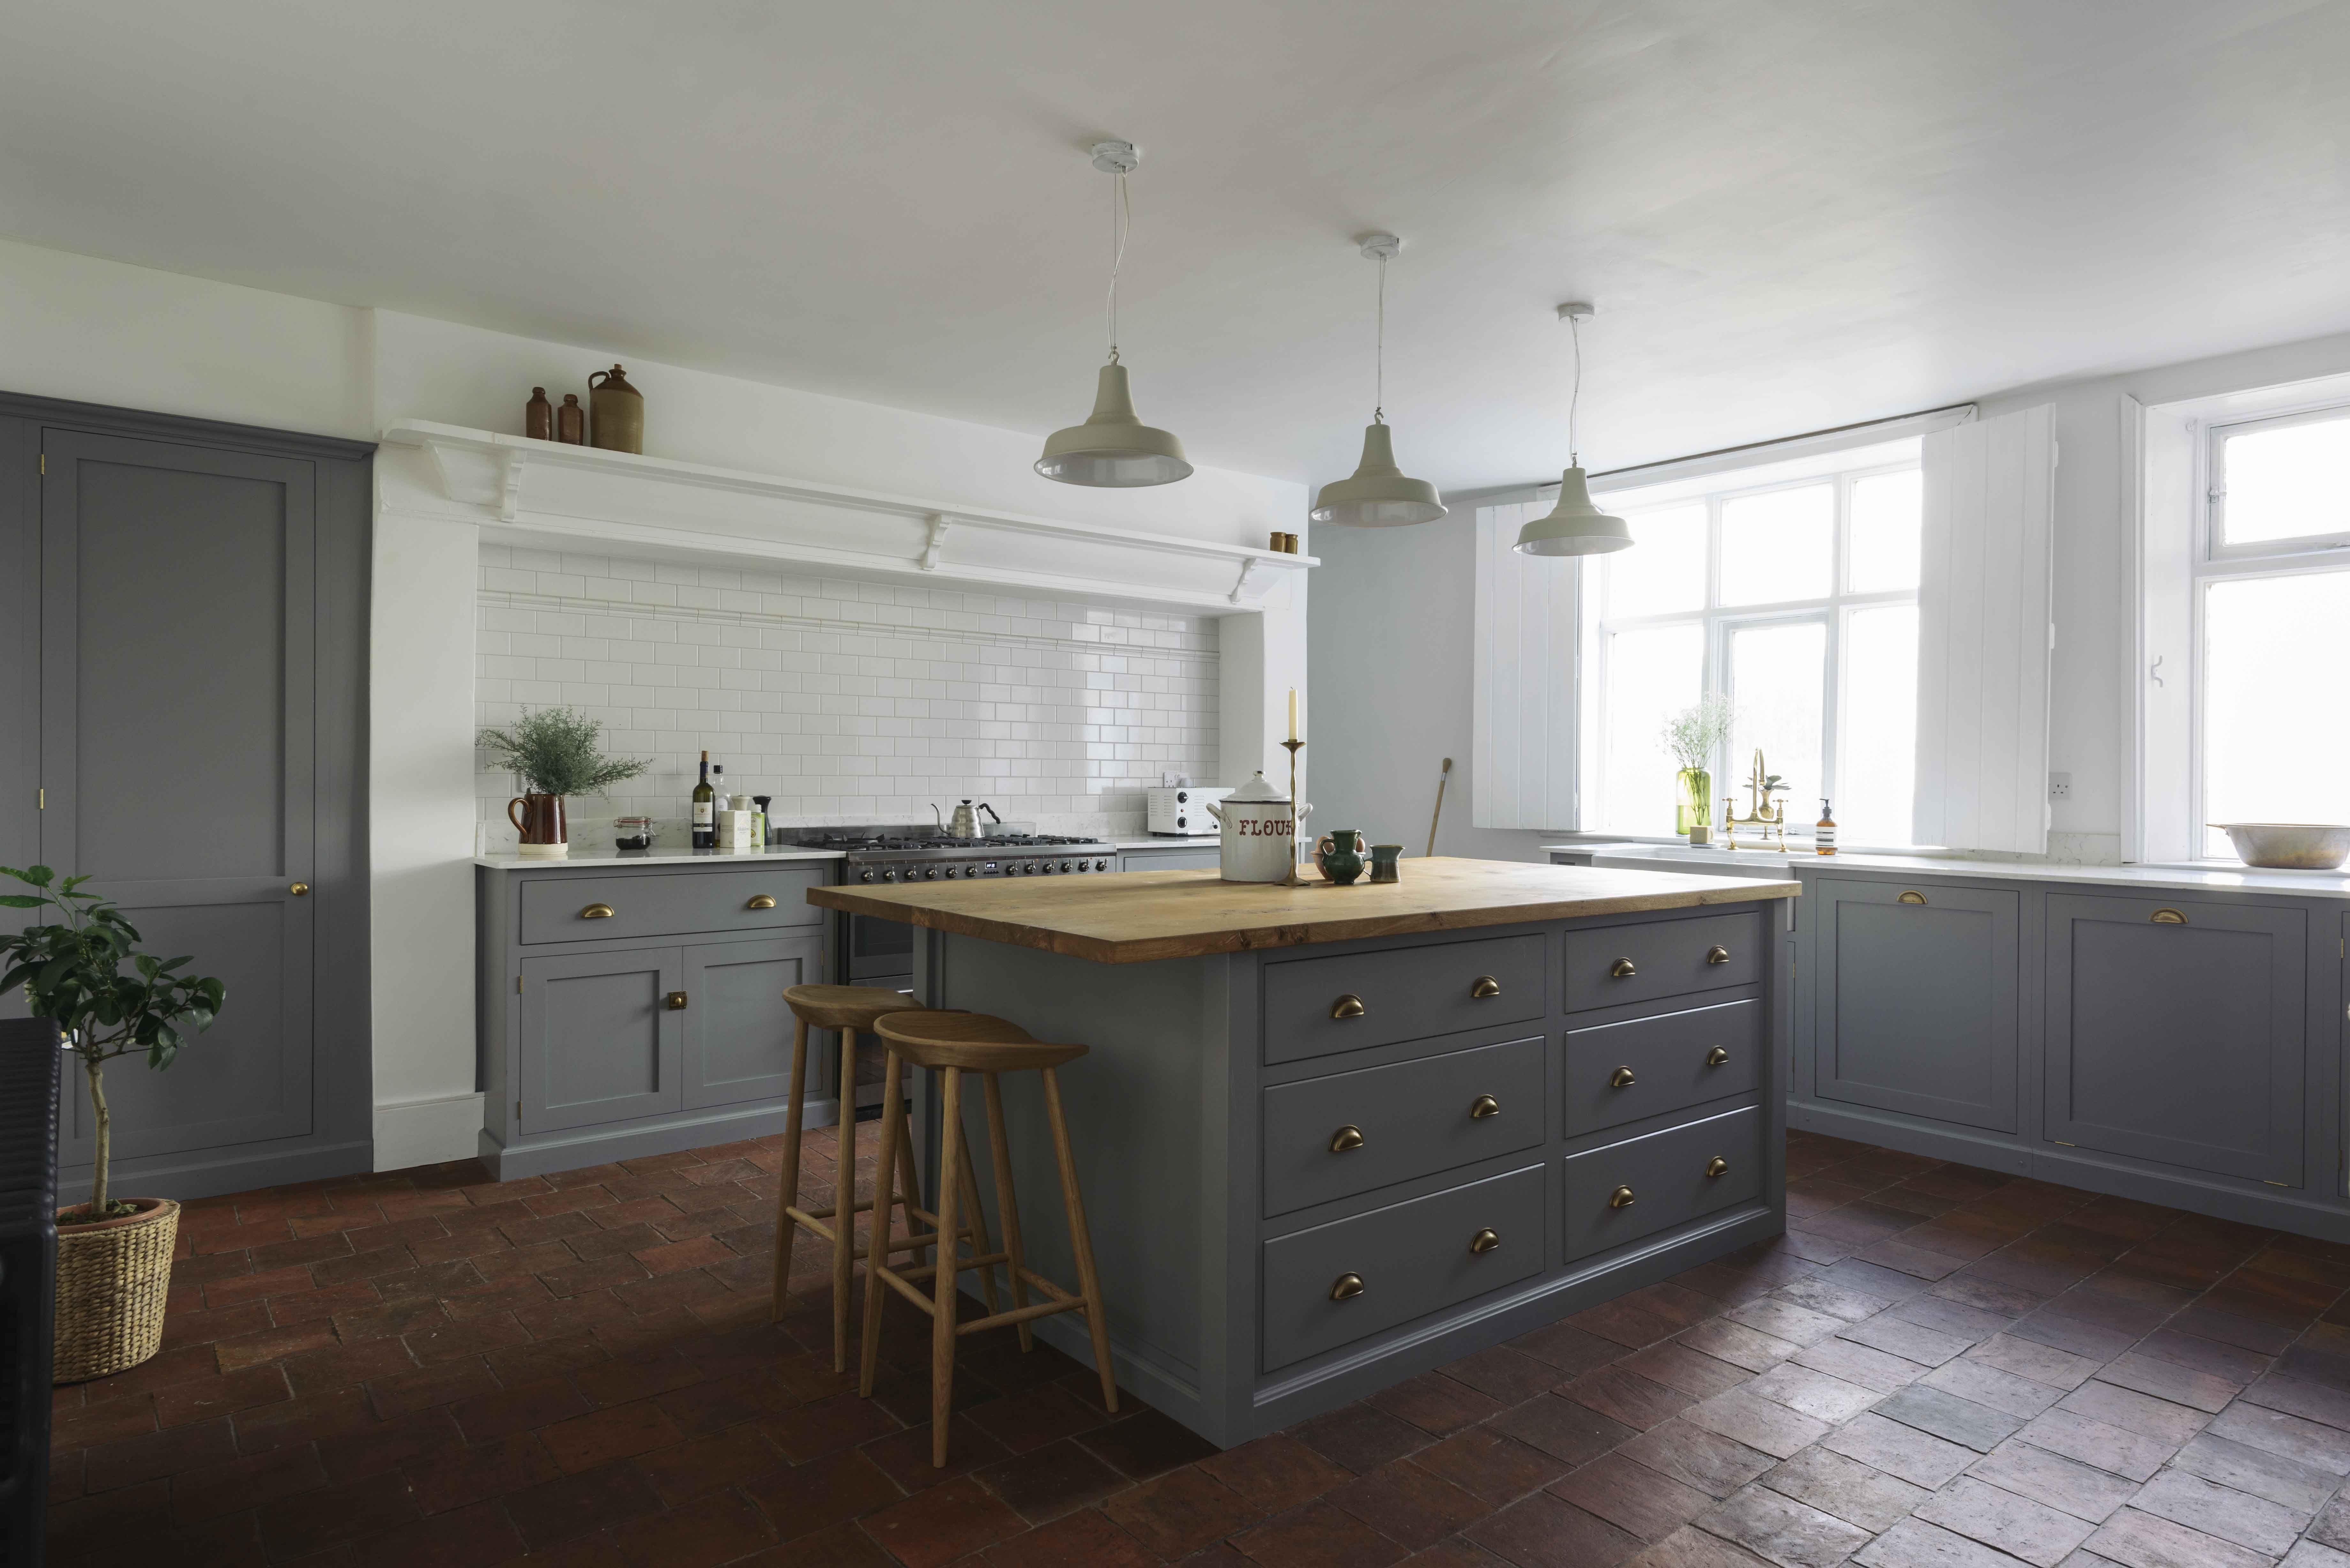 The Cheshire Townhouse Kitchen by deVOL | Kitchen | Pinterest ...